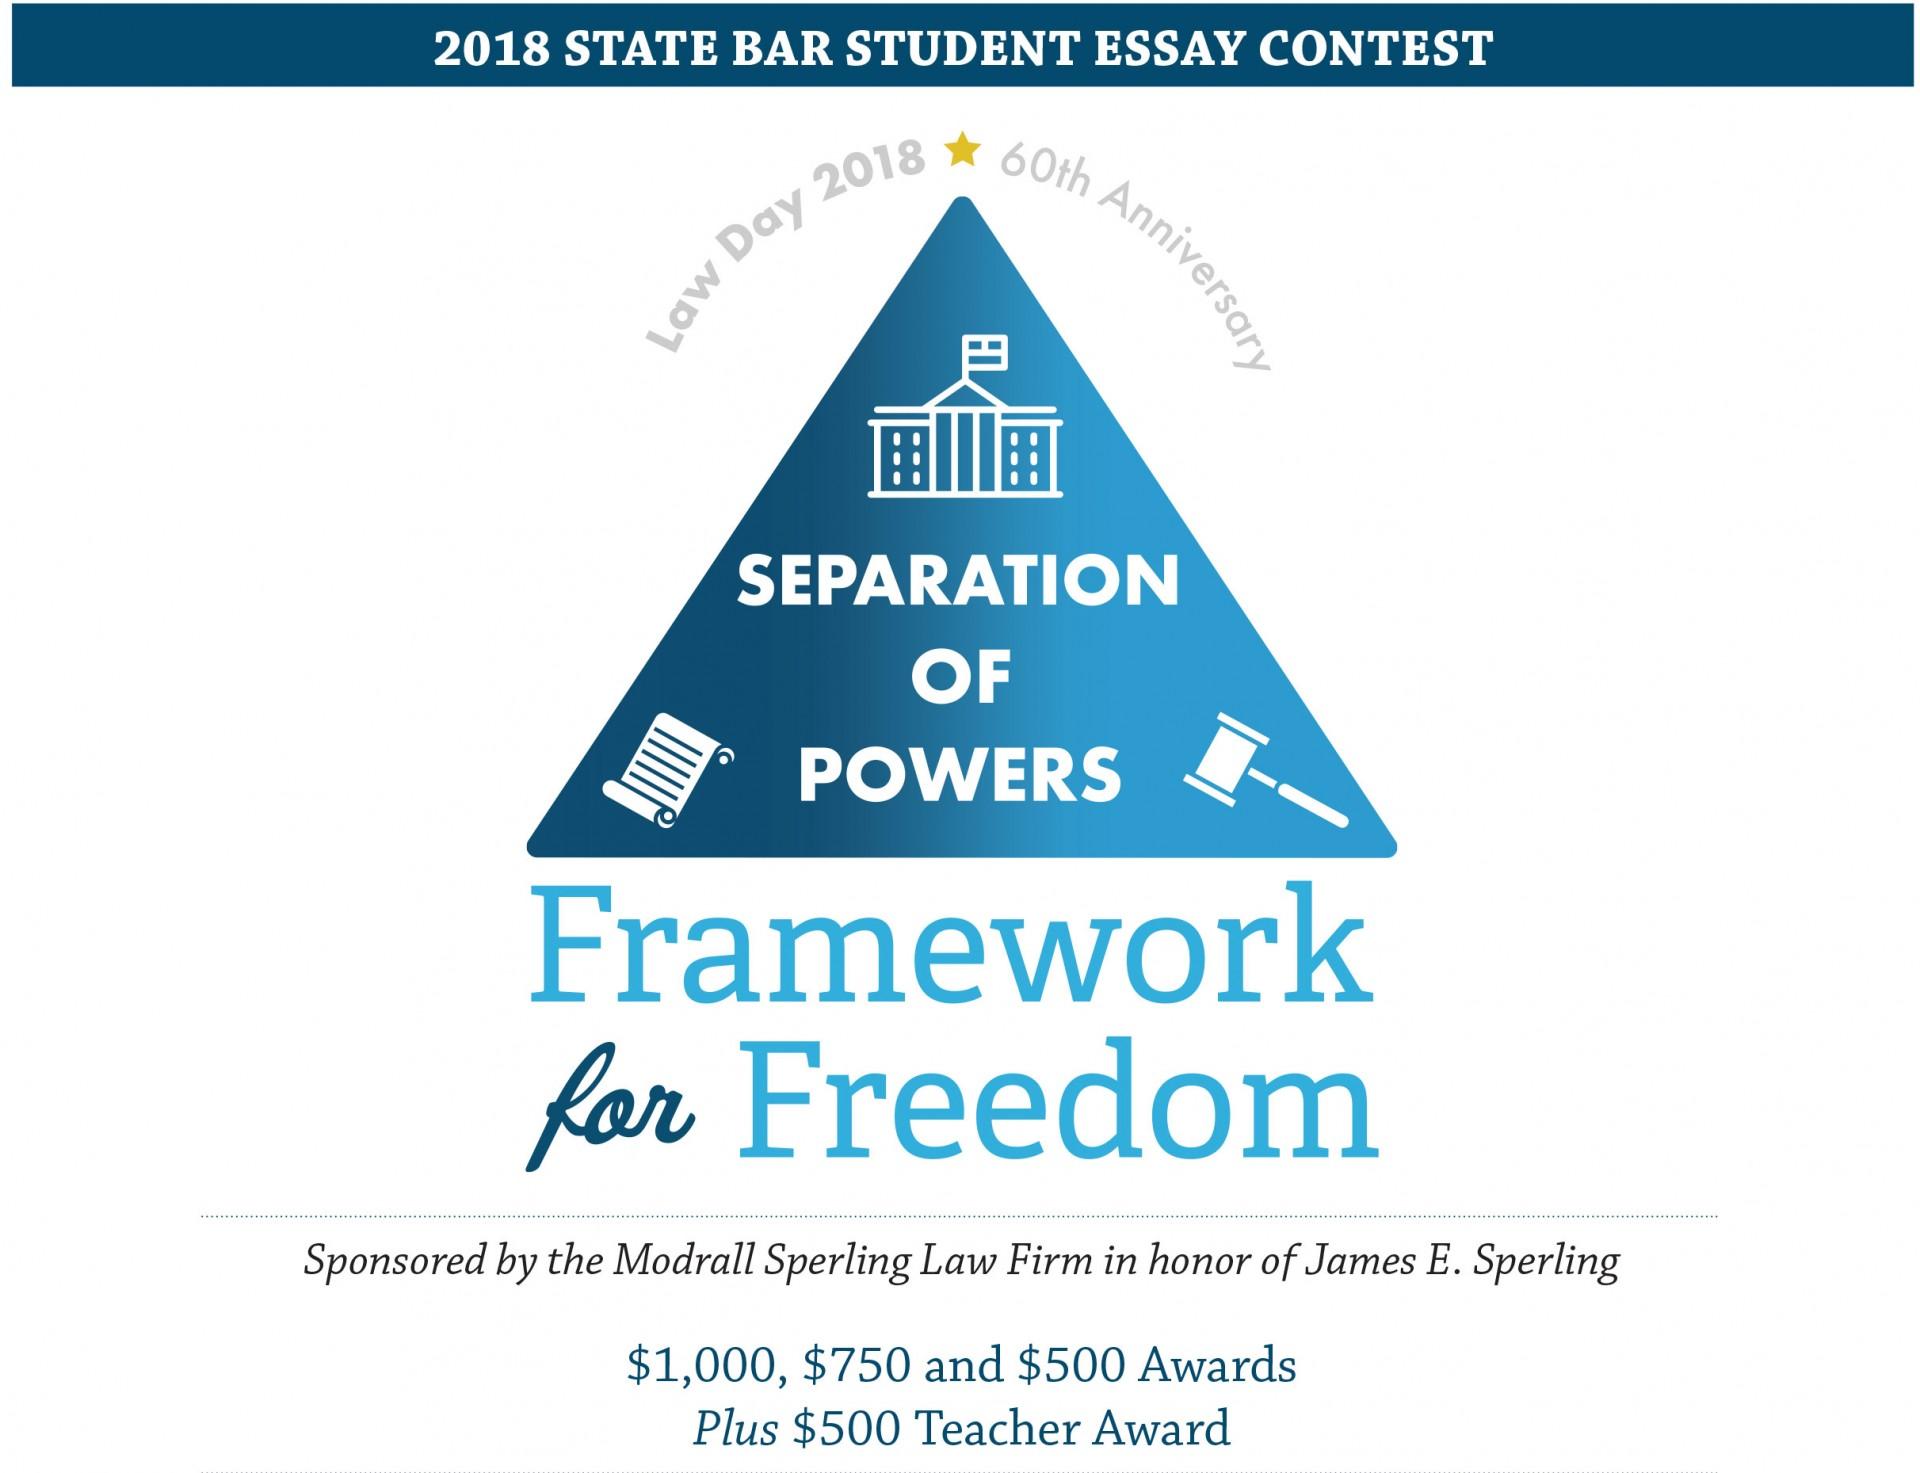 006 Separationofpowers Essay Contest Amazing Writing High School Contests For Seniors 2018 1920